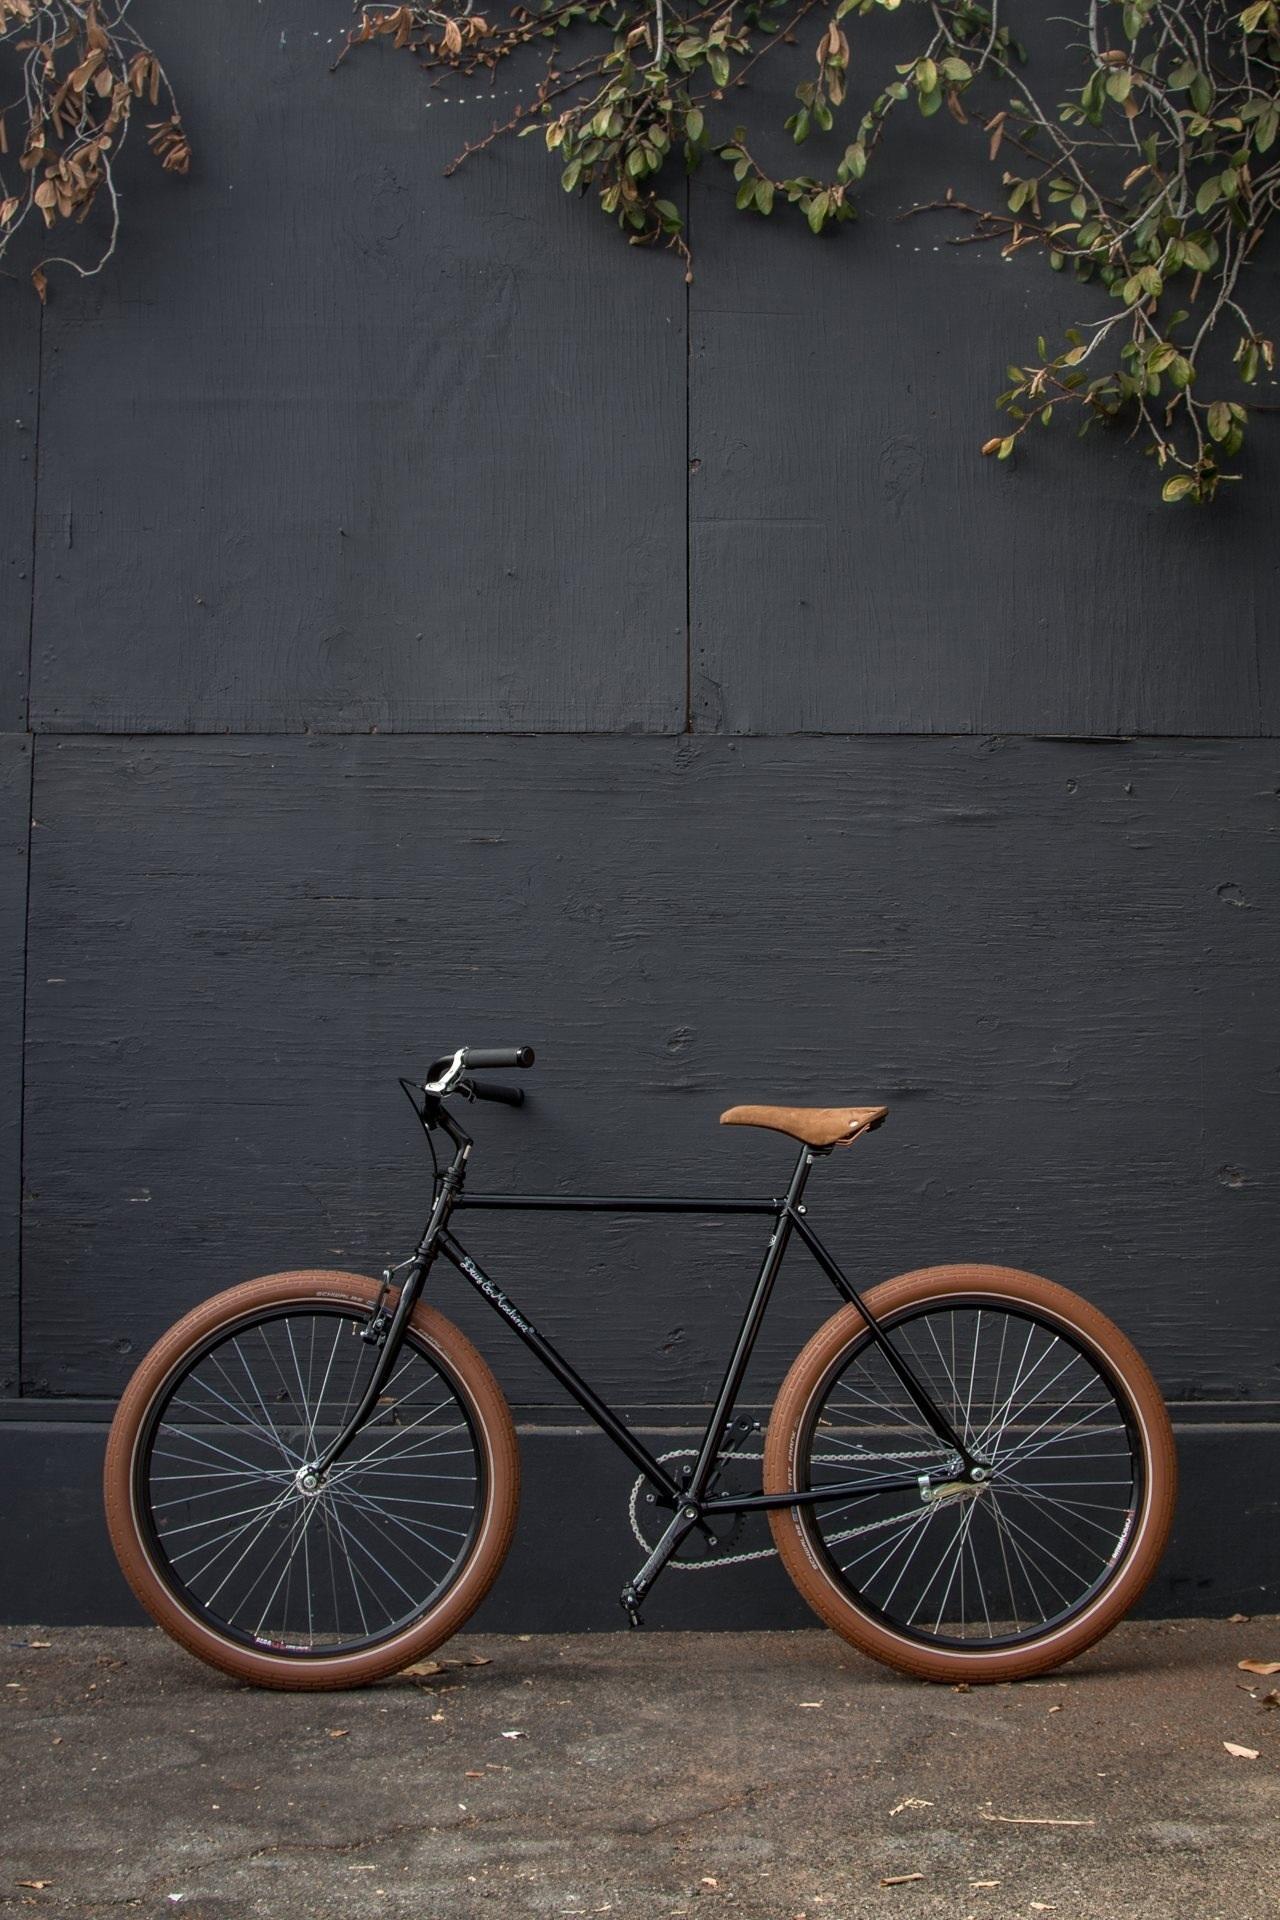 bike outdoors street wood rusty abandoned vehicle nature daylight urban